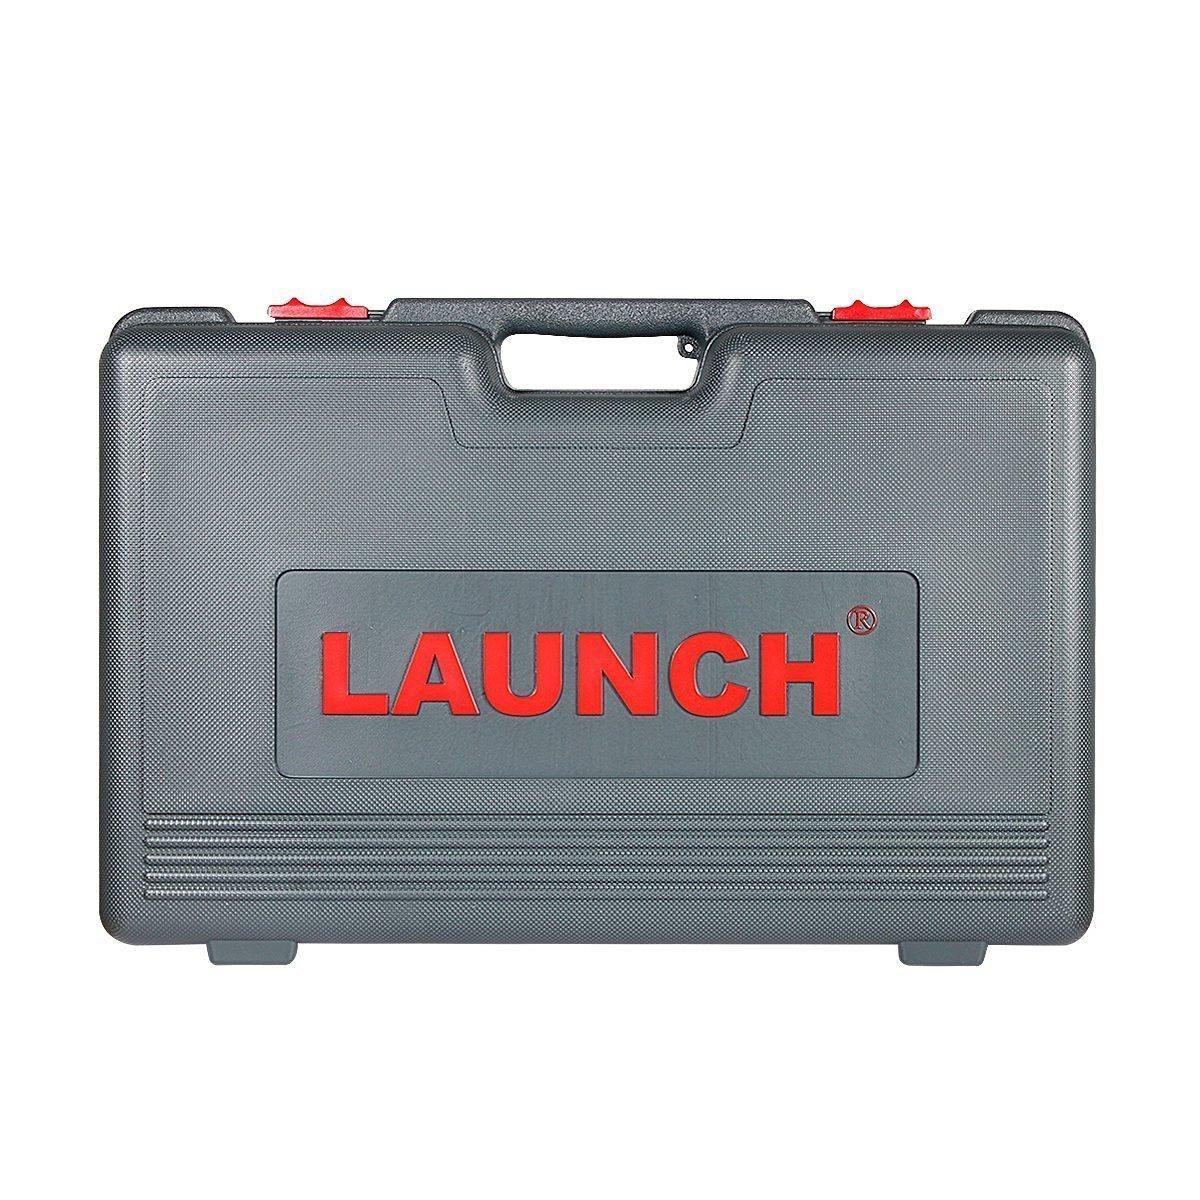 LAUNCH X431 HD Heavy Duty Truck Diagnostic Module X431 V+, X431 Pro3 V2.0 by LAUNCH (Image #4)